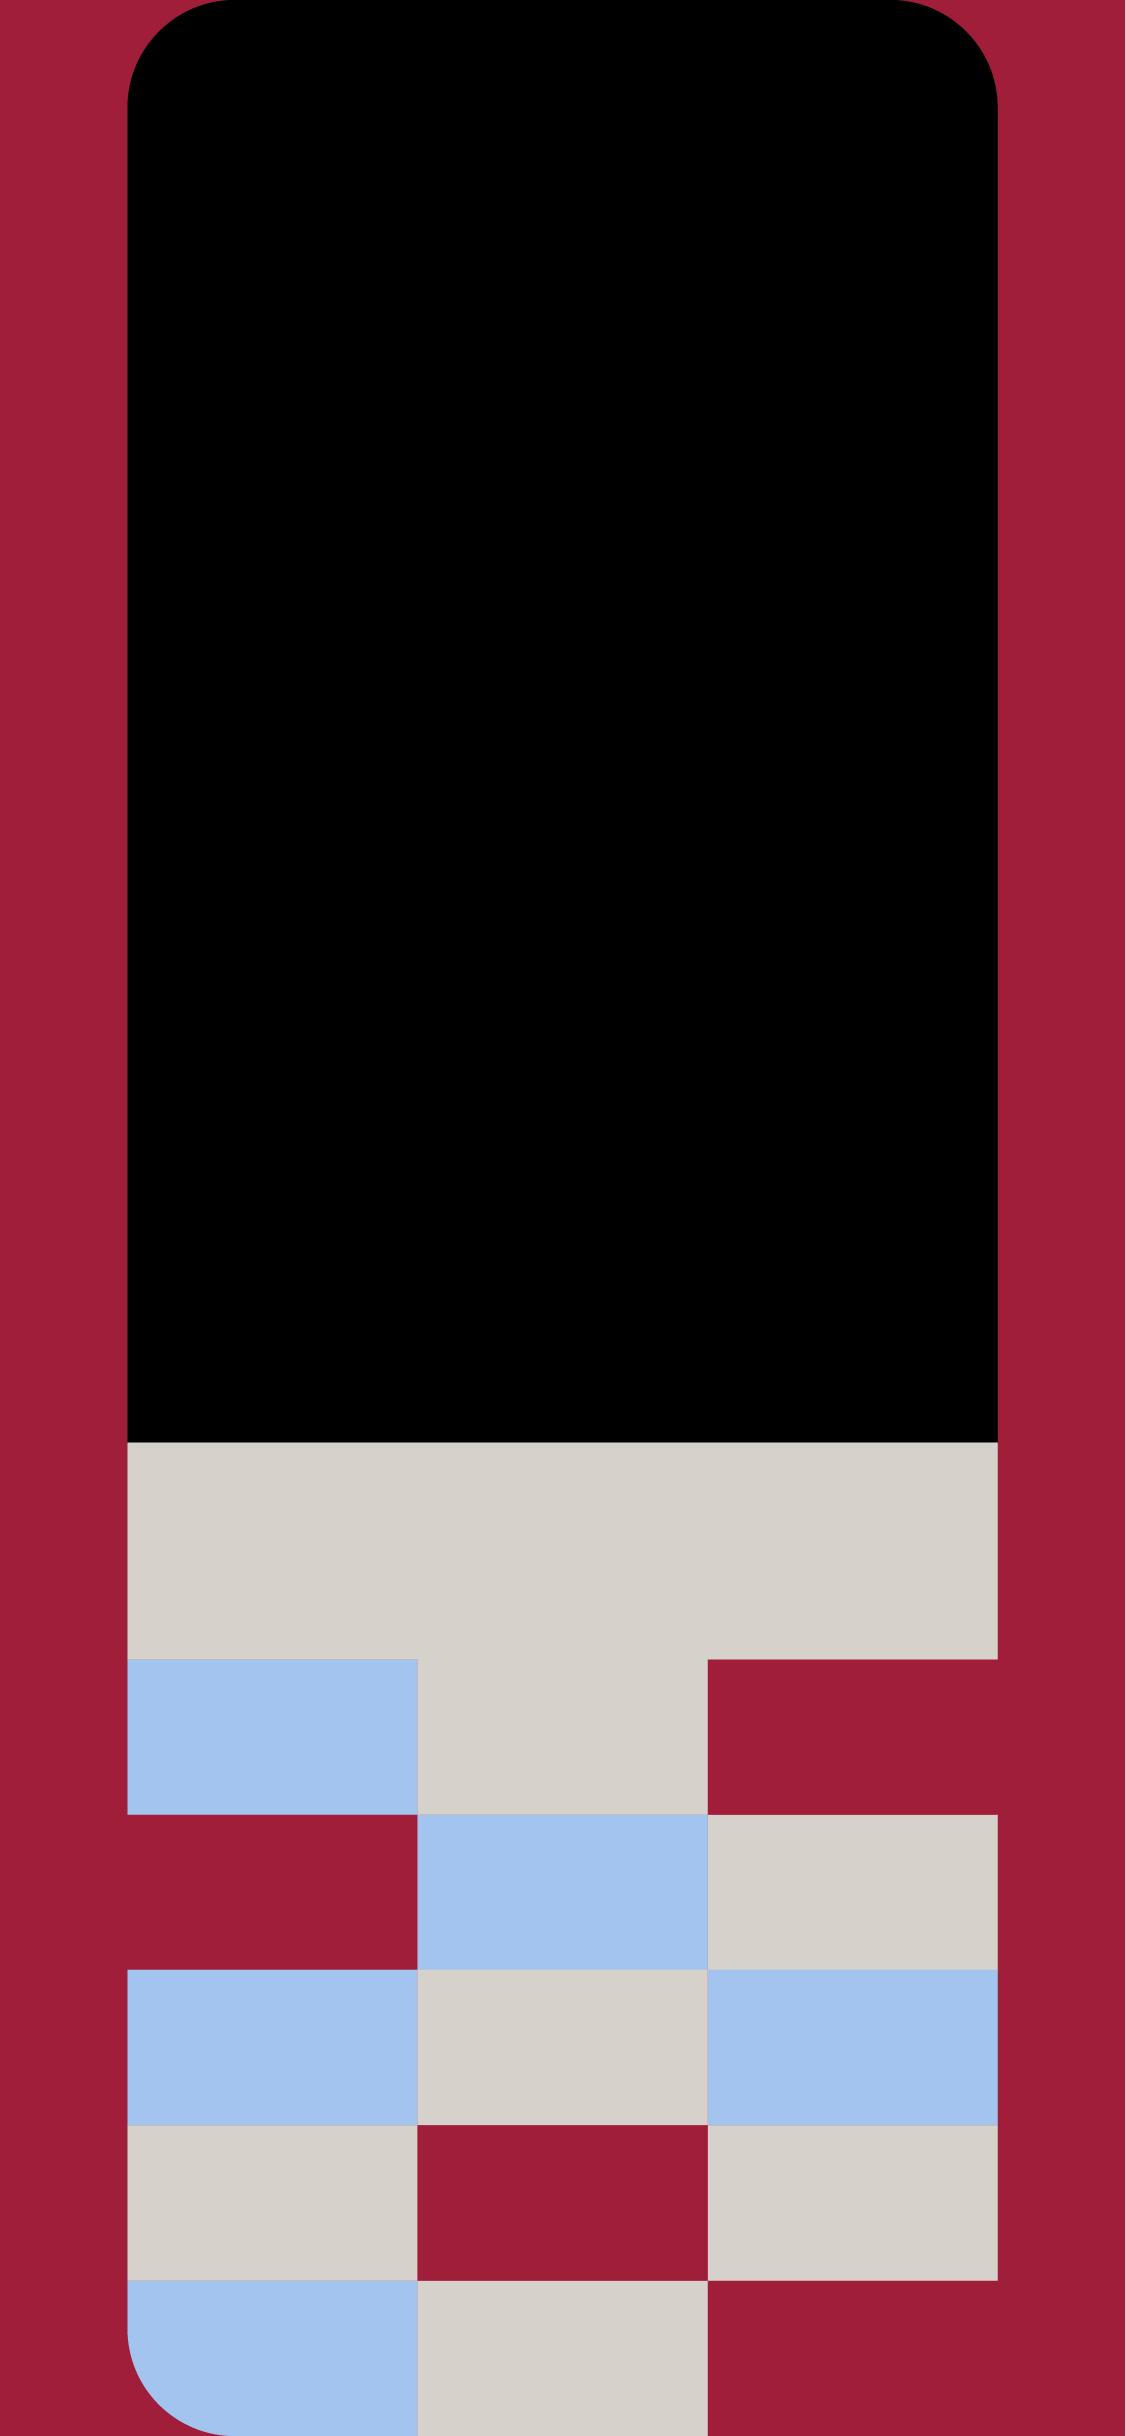 NISHIKIGOI | ロック中の画面用(ロゴ無し)